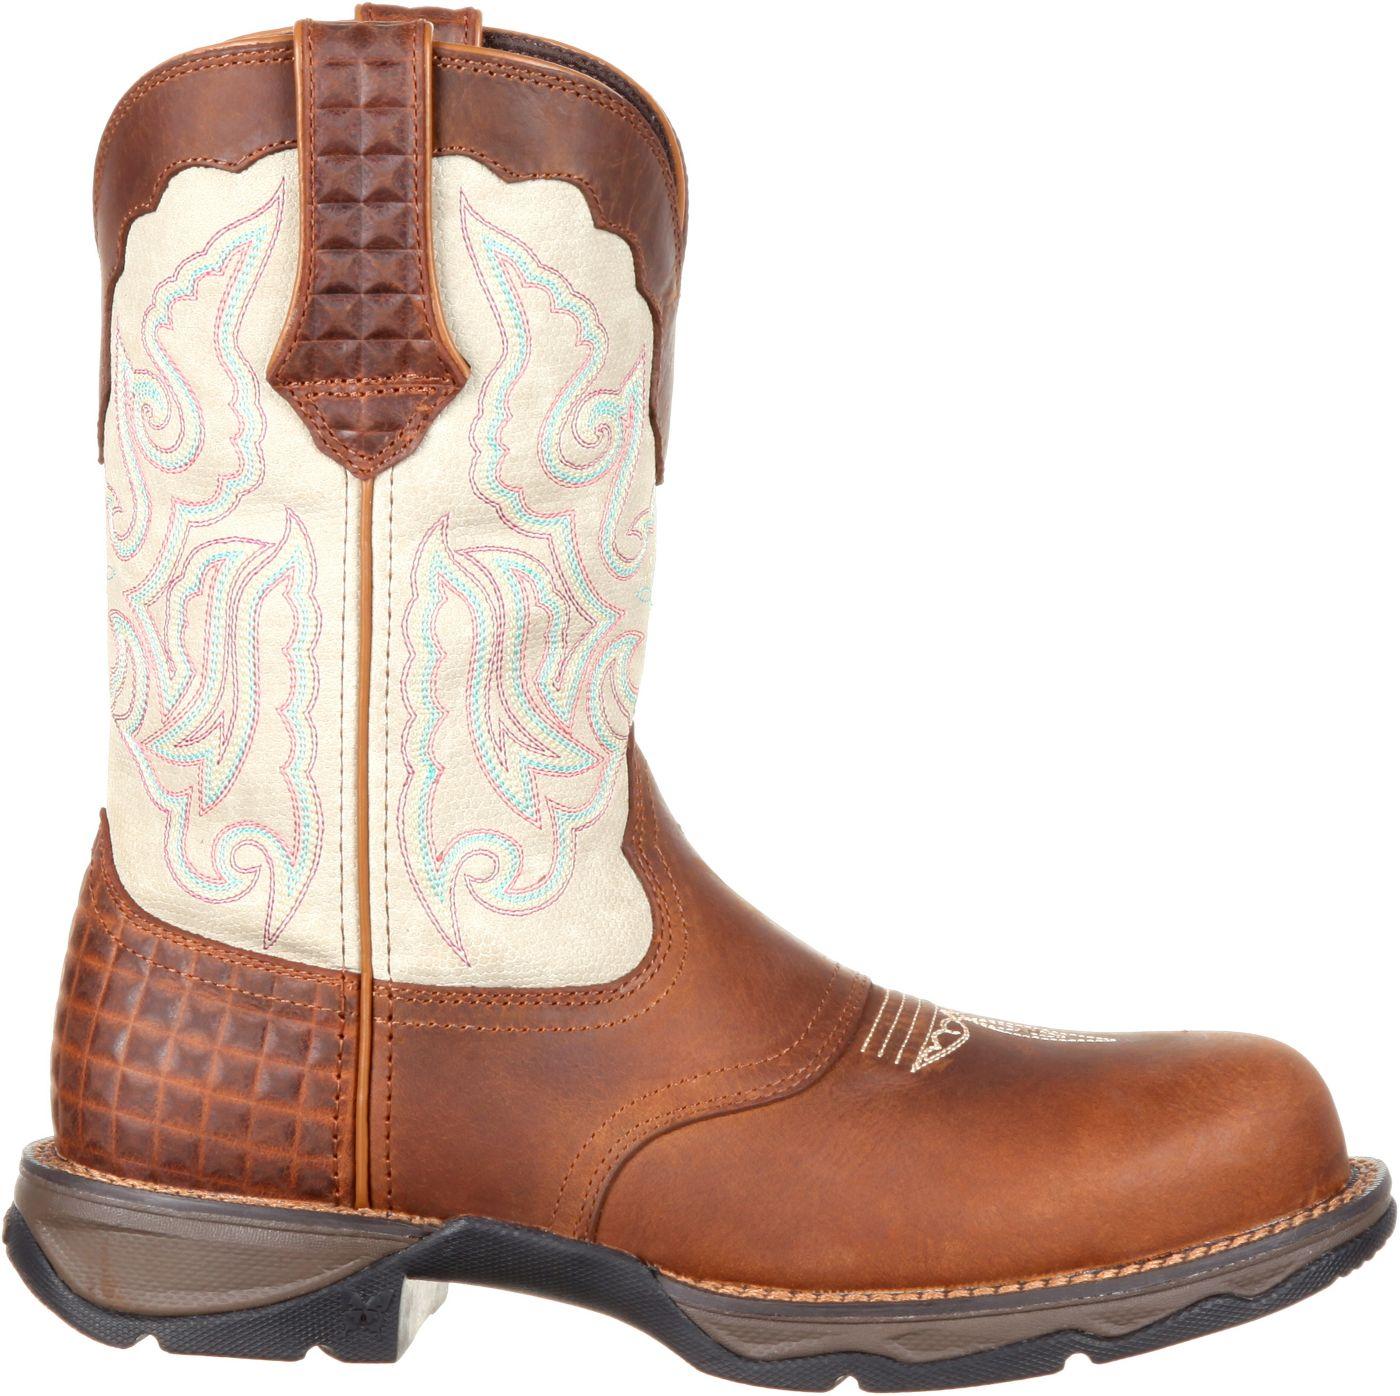 Durango Women's Lady Rebel Composite Toe Western Work Boots